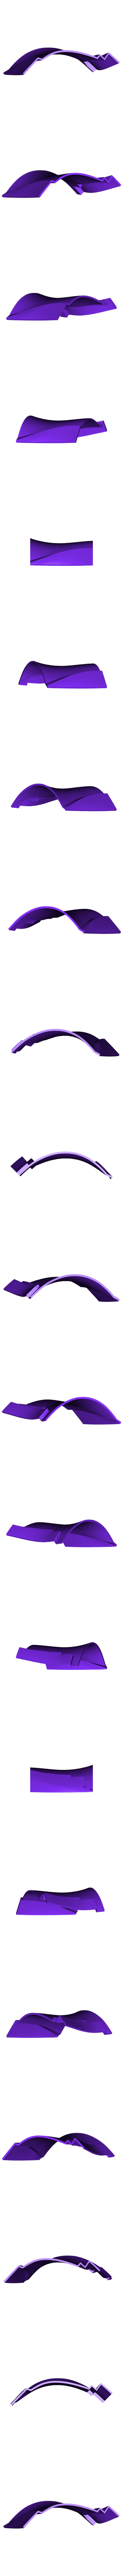 Part_5_v2.stl Download free STL file Senate Guard Helmet (Star Wars) • 3D printer design, VillainousPropShop